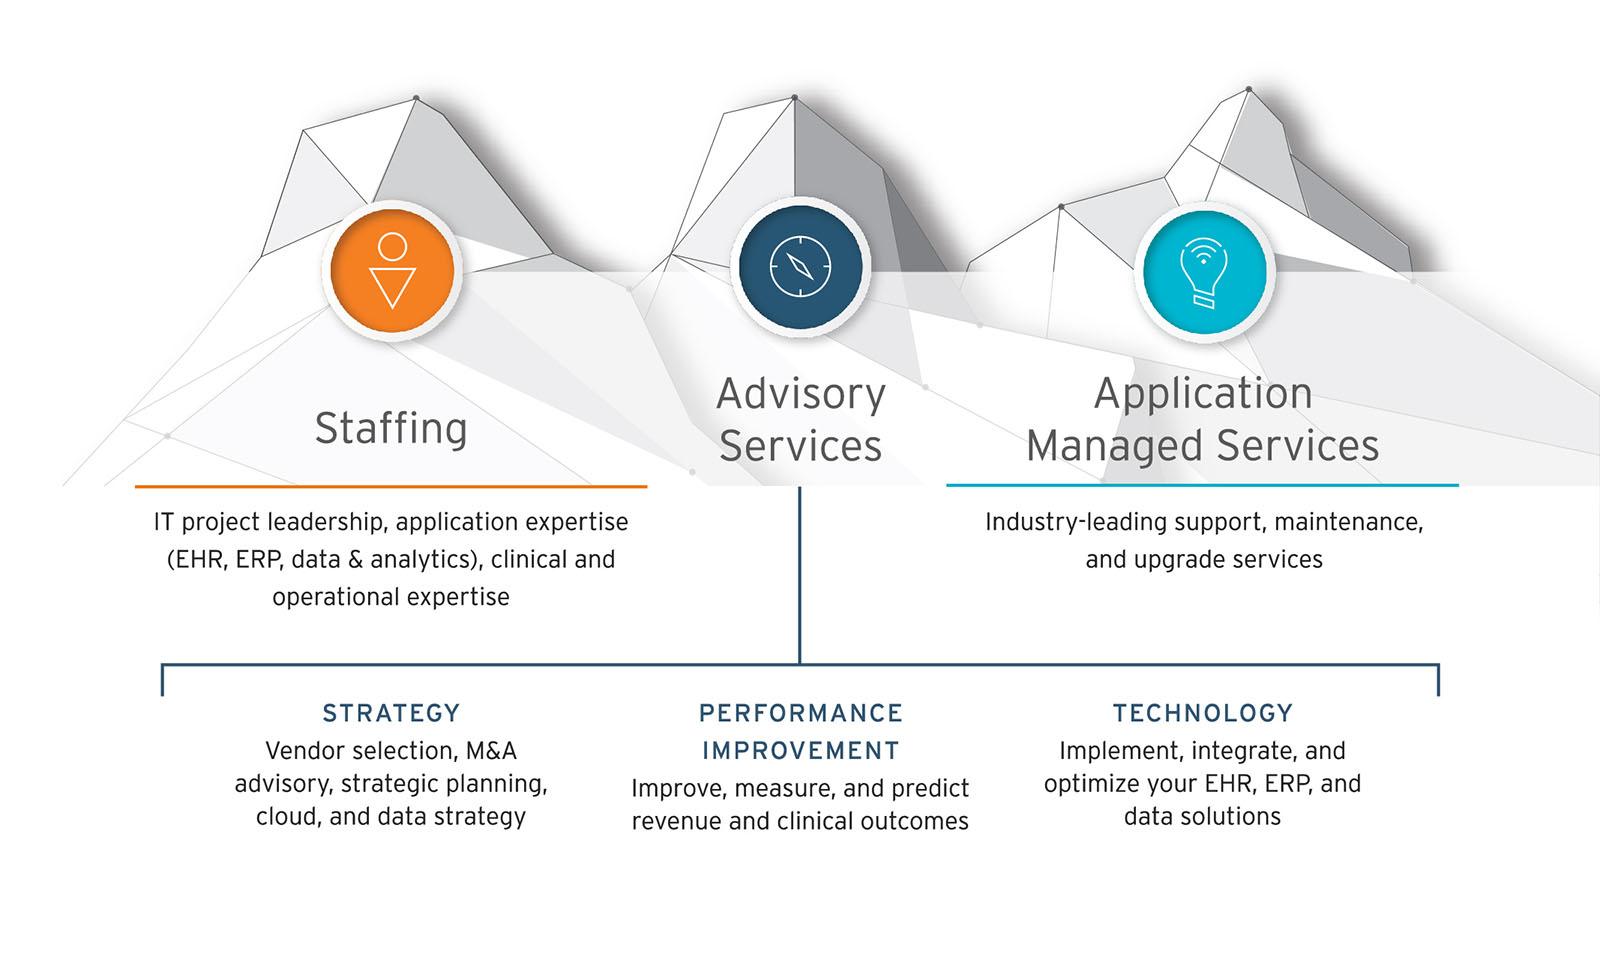 Service Mountain Graphic